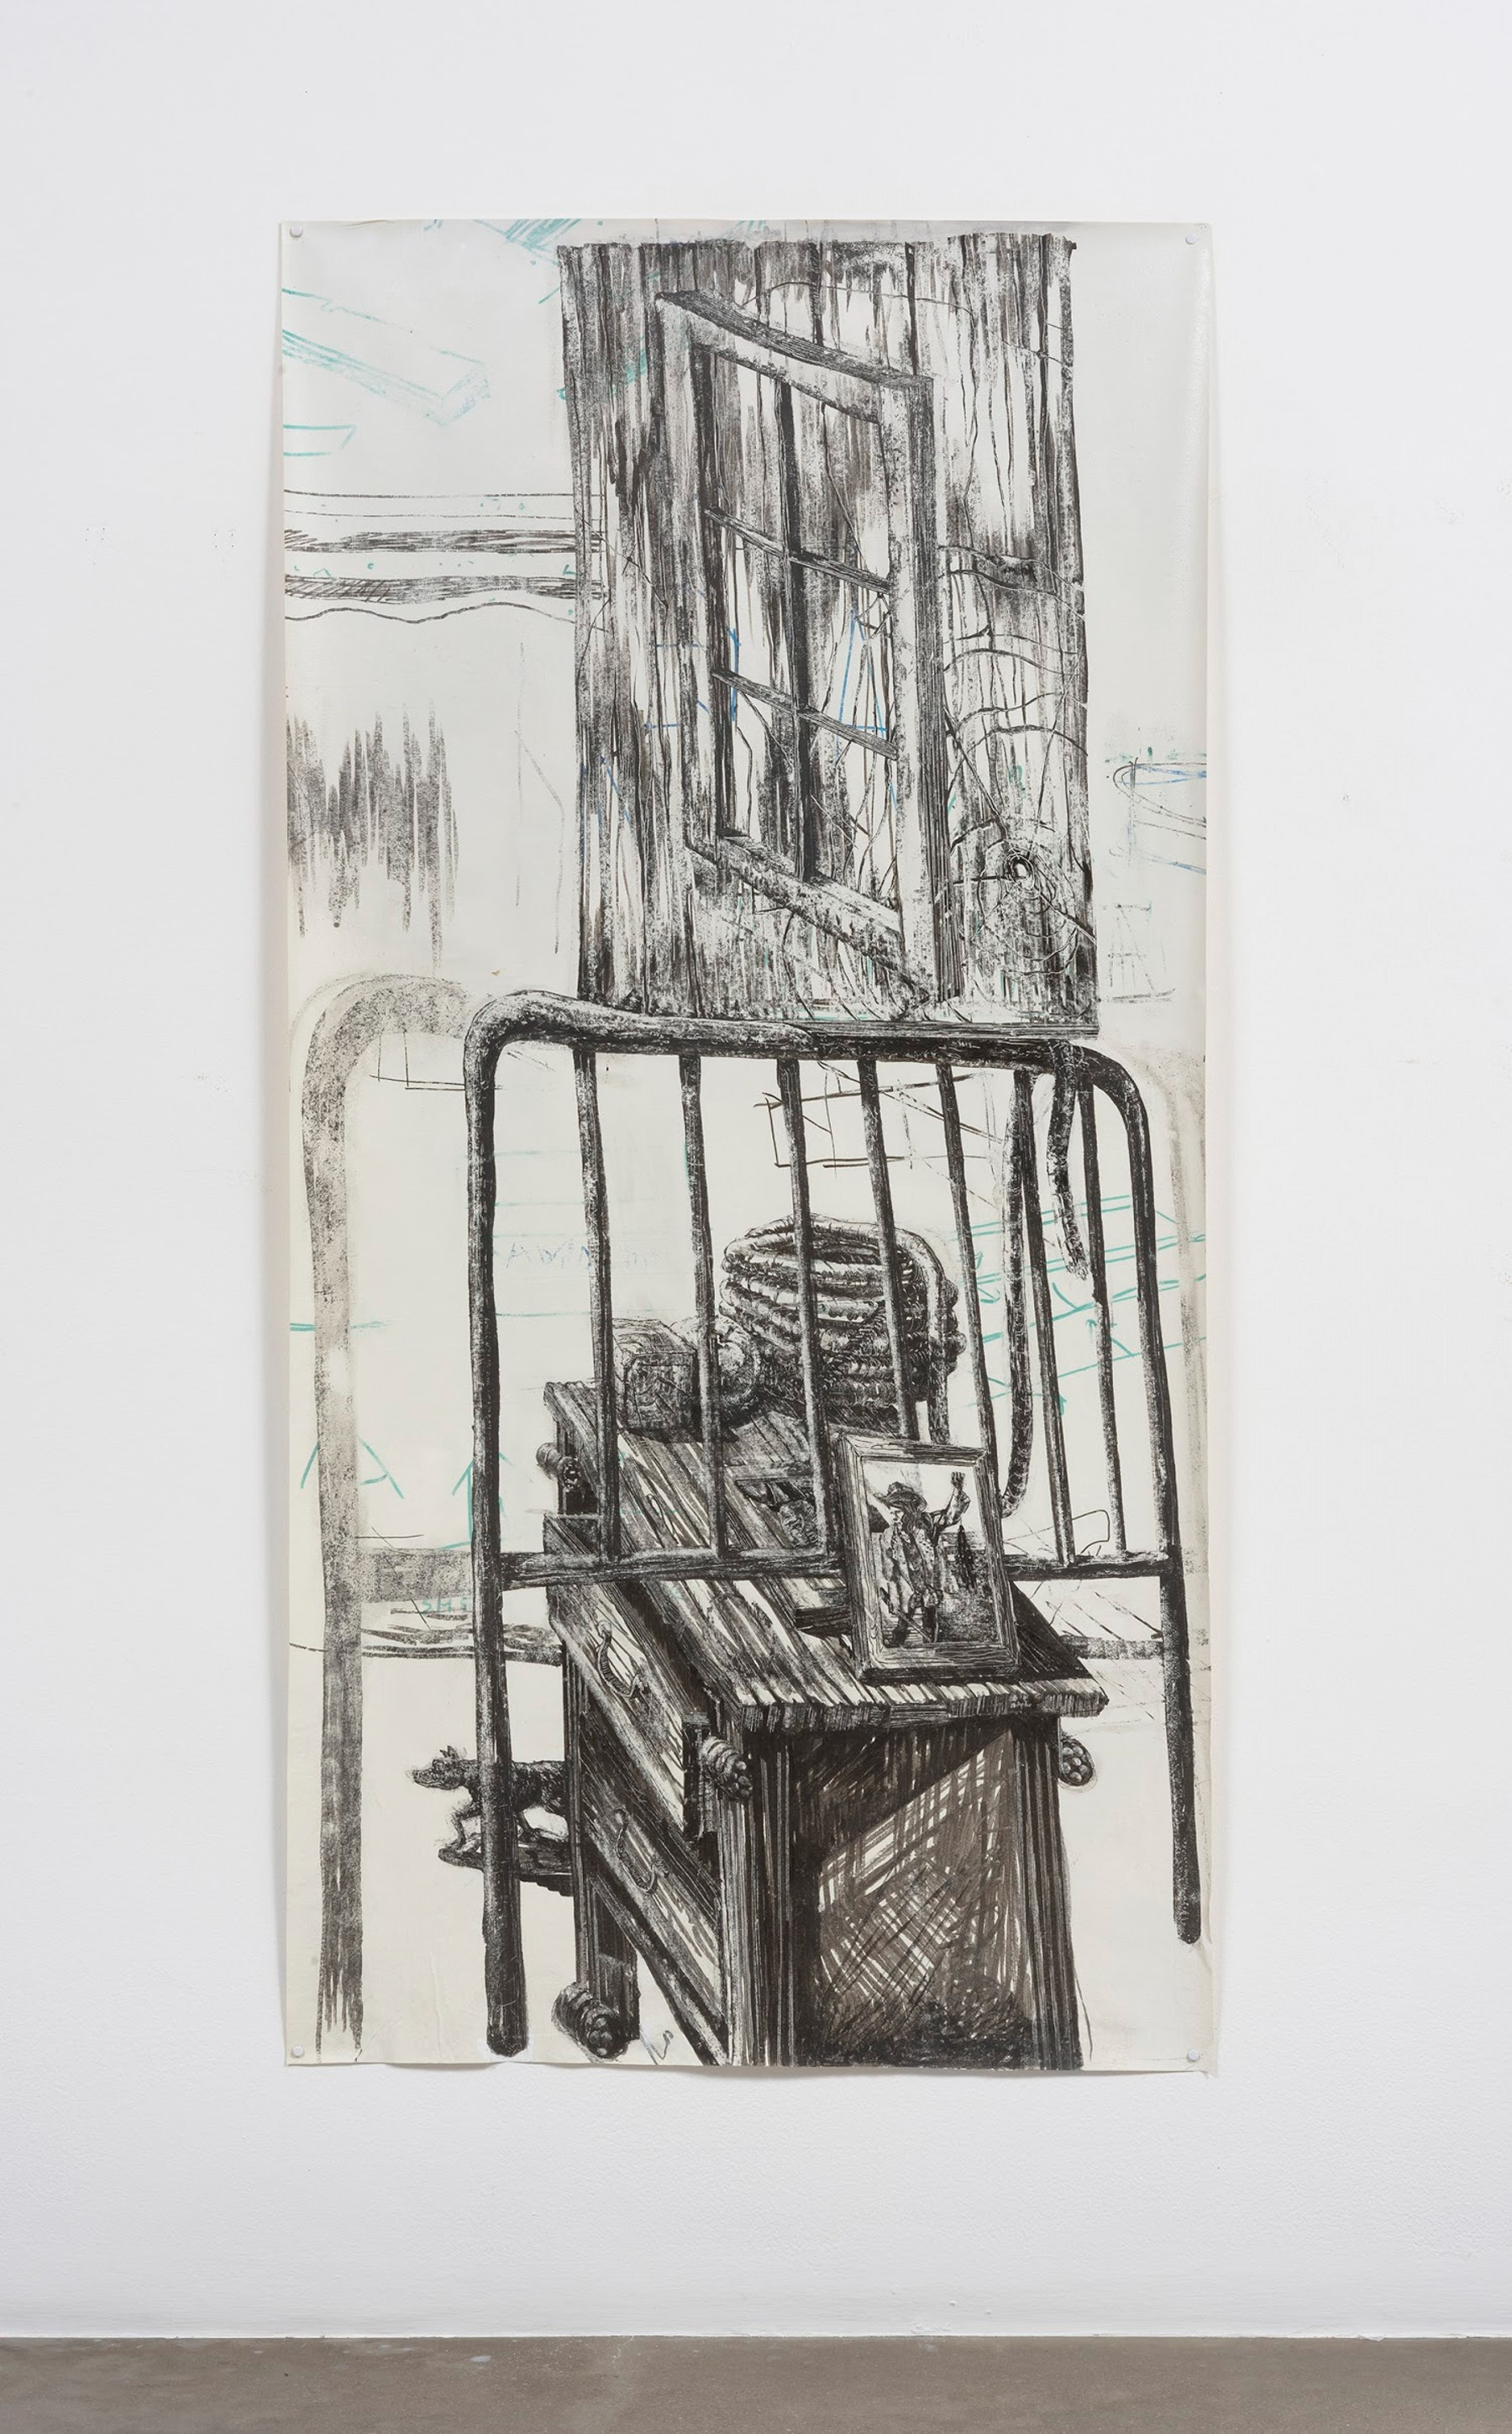 "Edgar Arceneaux ""Migrant's Totem II,"" 2017 Dry erase pen on muslin 69 x 35"" [HxW] (175.26 x 88.9 cm) Inventory #ARC568 Courtesy of the artist and Vielmetter Los Angeles Photo credit: Robert Wedemeyer"